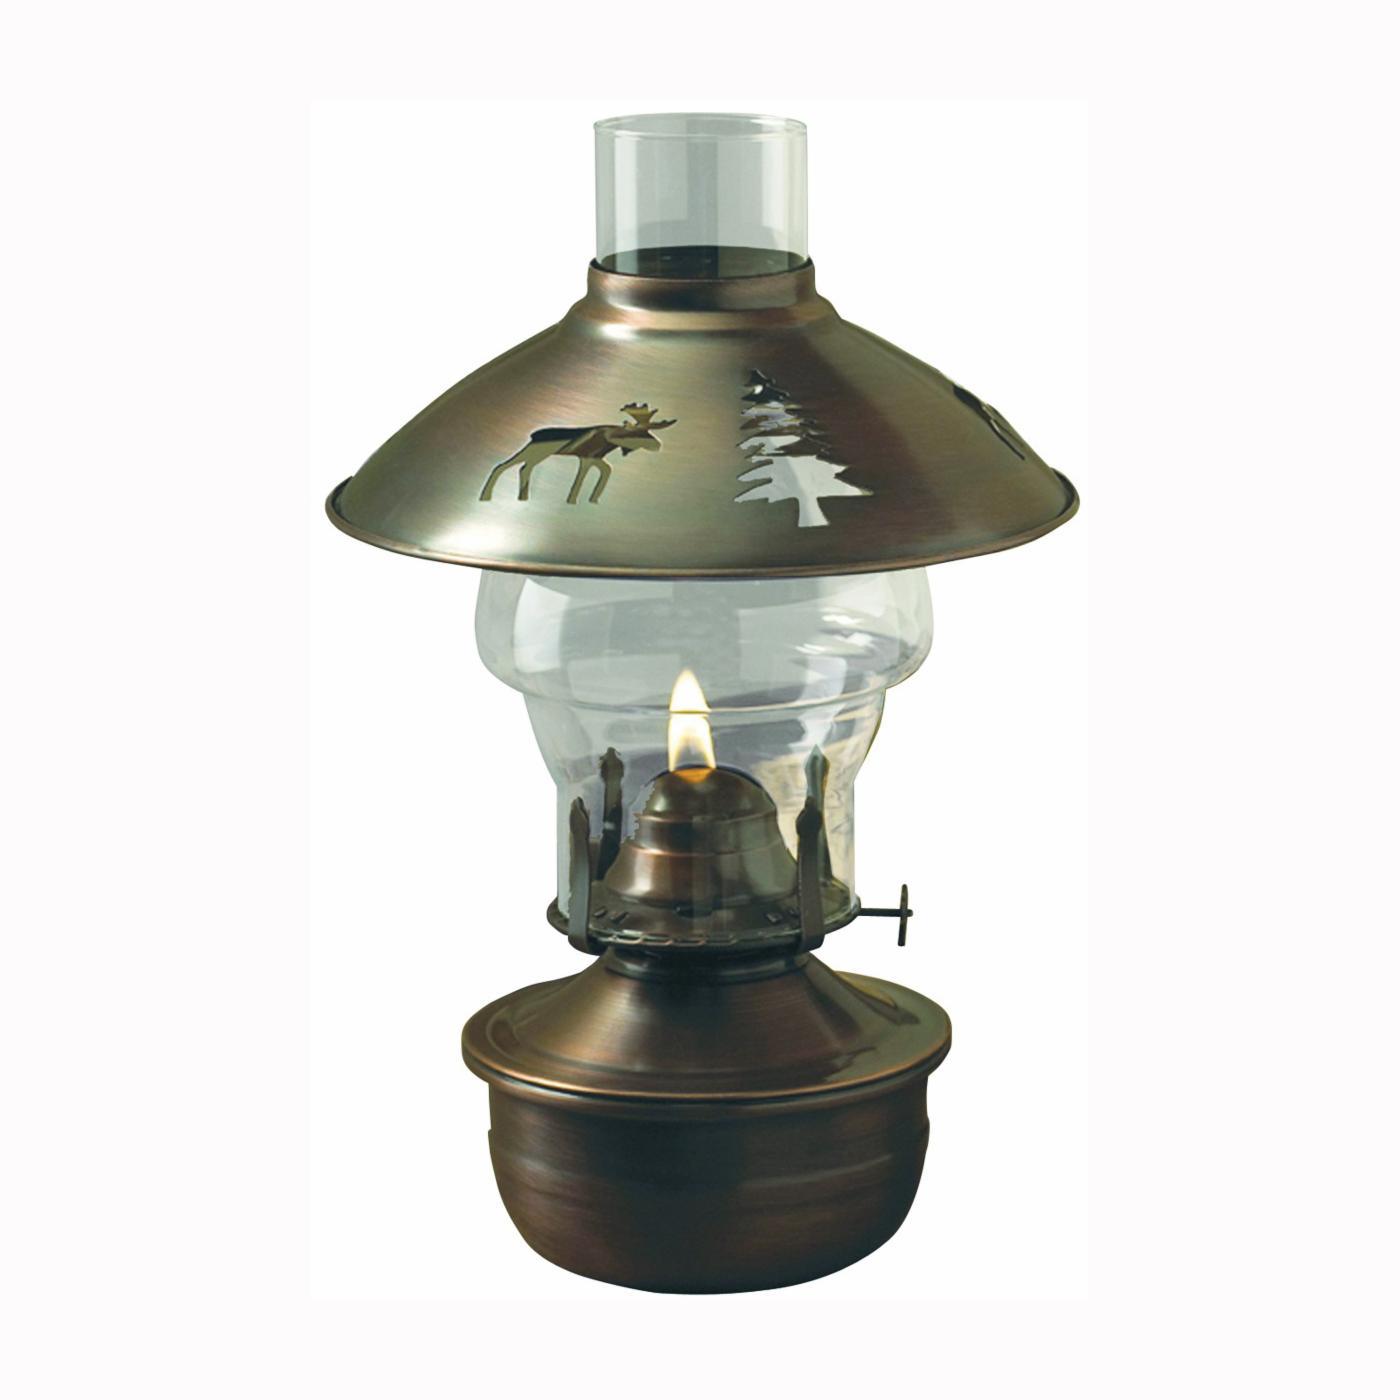 Lamplight 50840